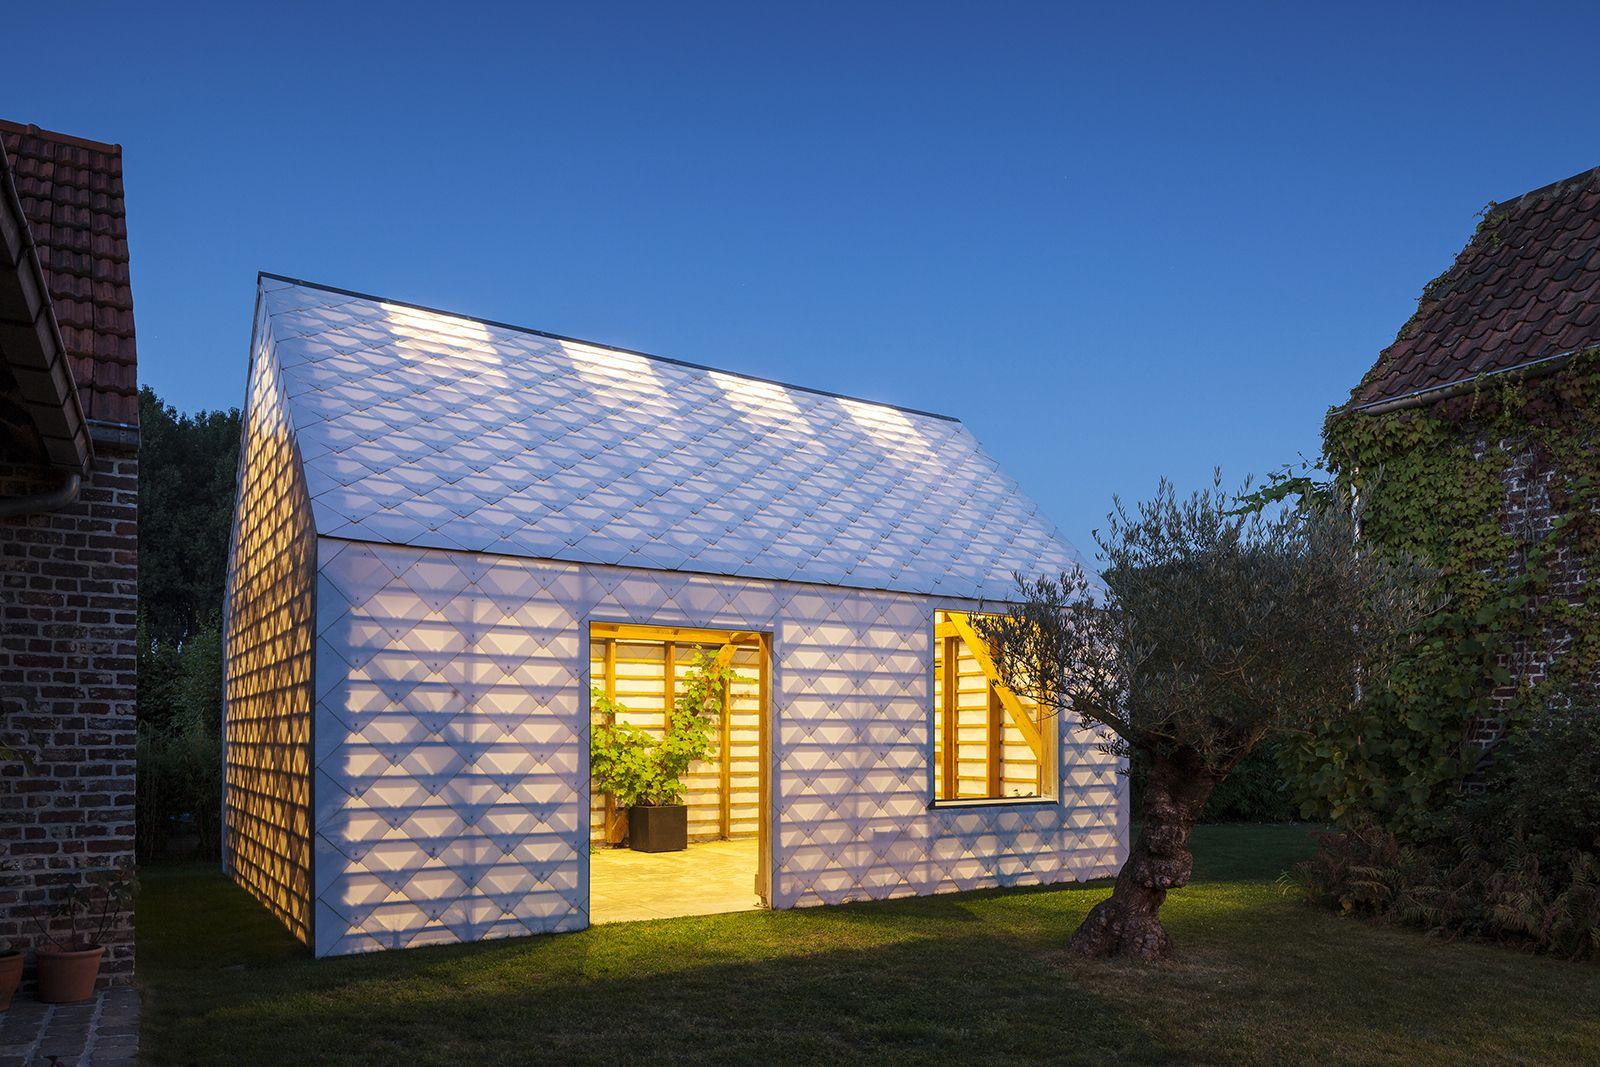 using workaday materials architect indra janda creatively